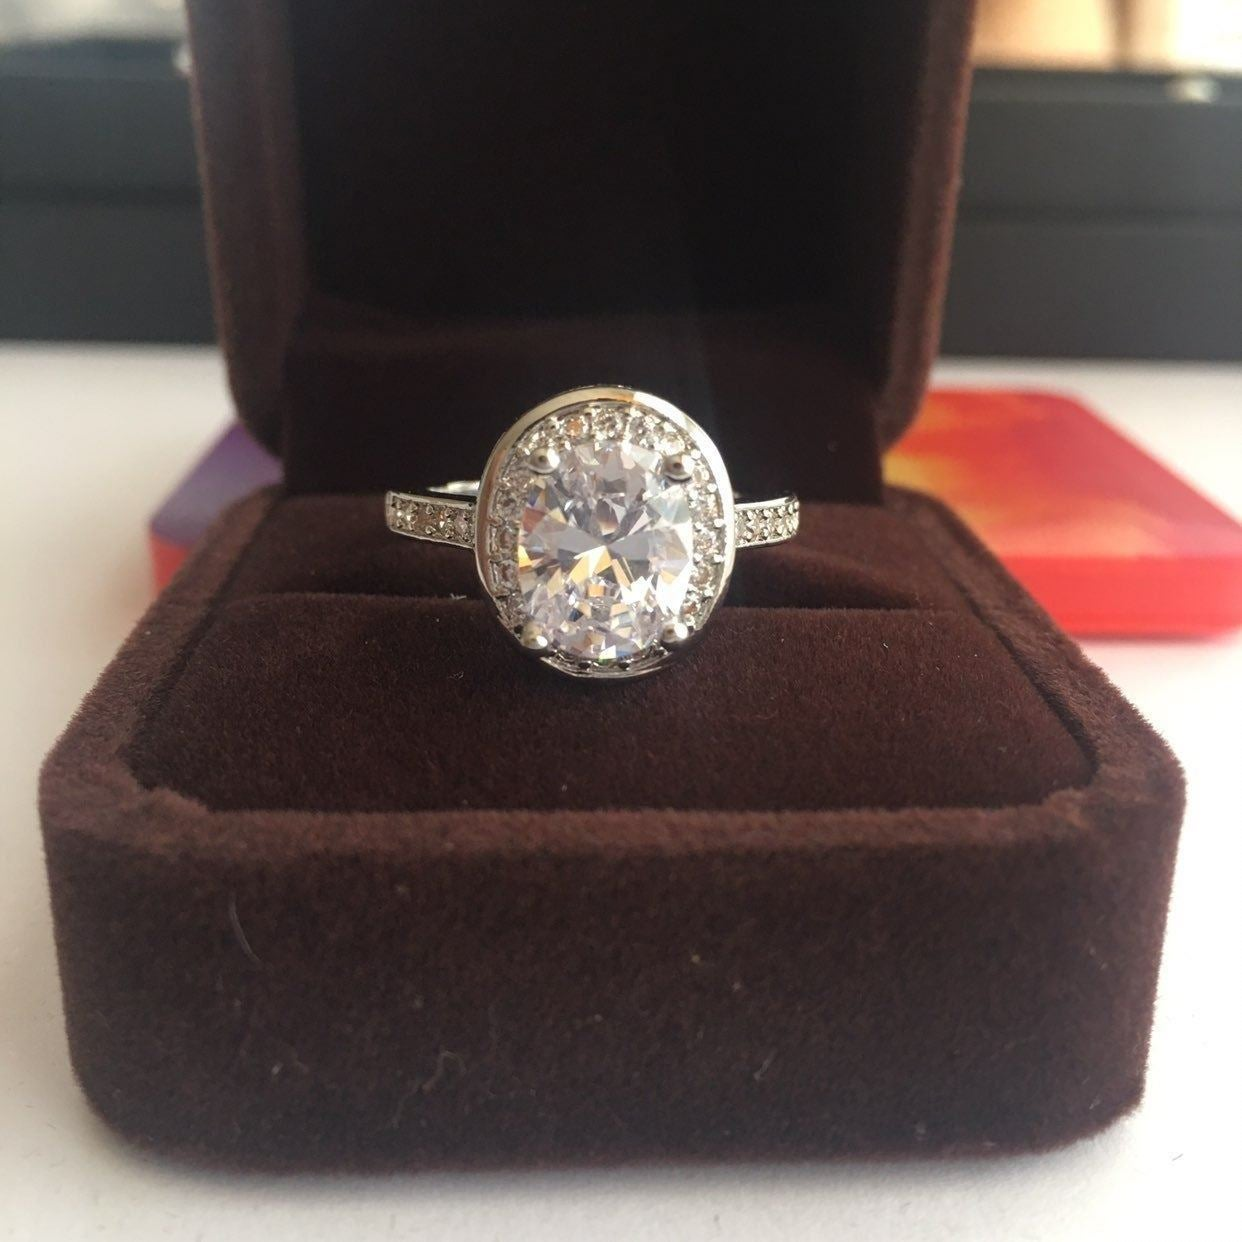 925/18K 3ct OVAL CUT WEDDING RING S9